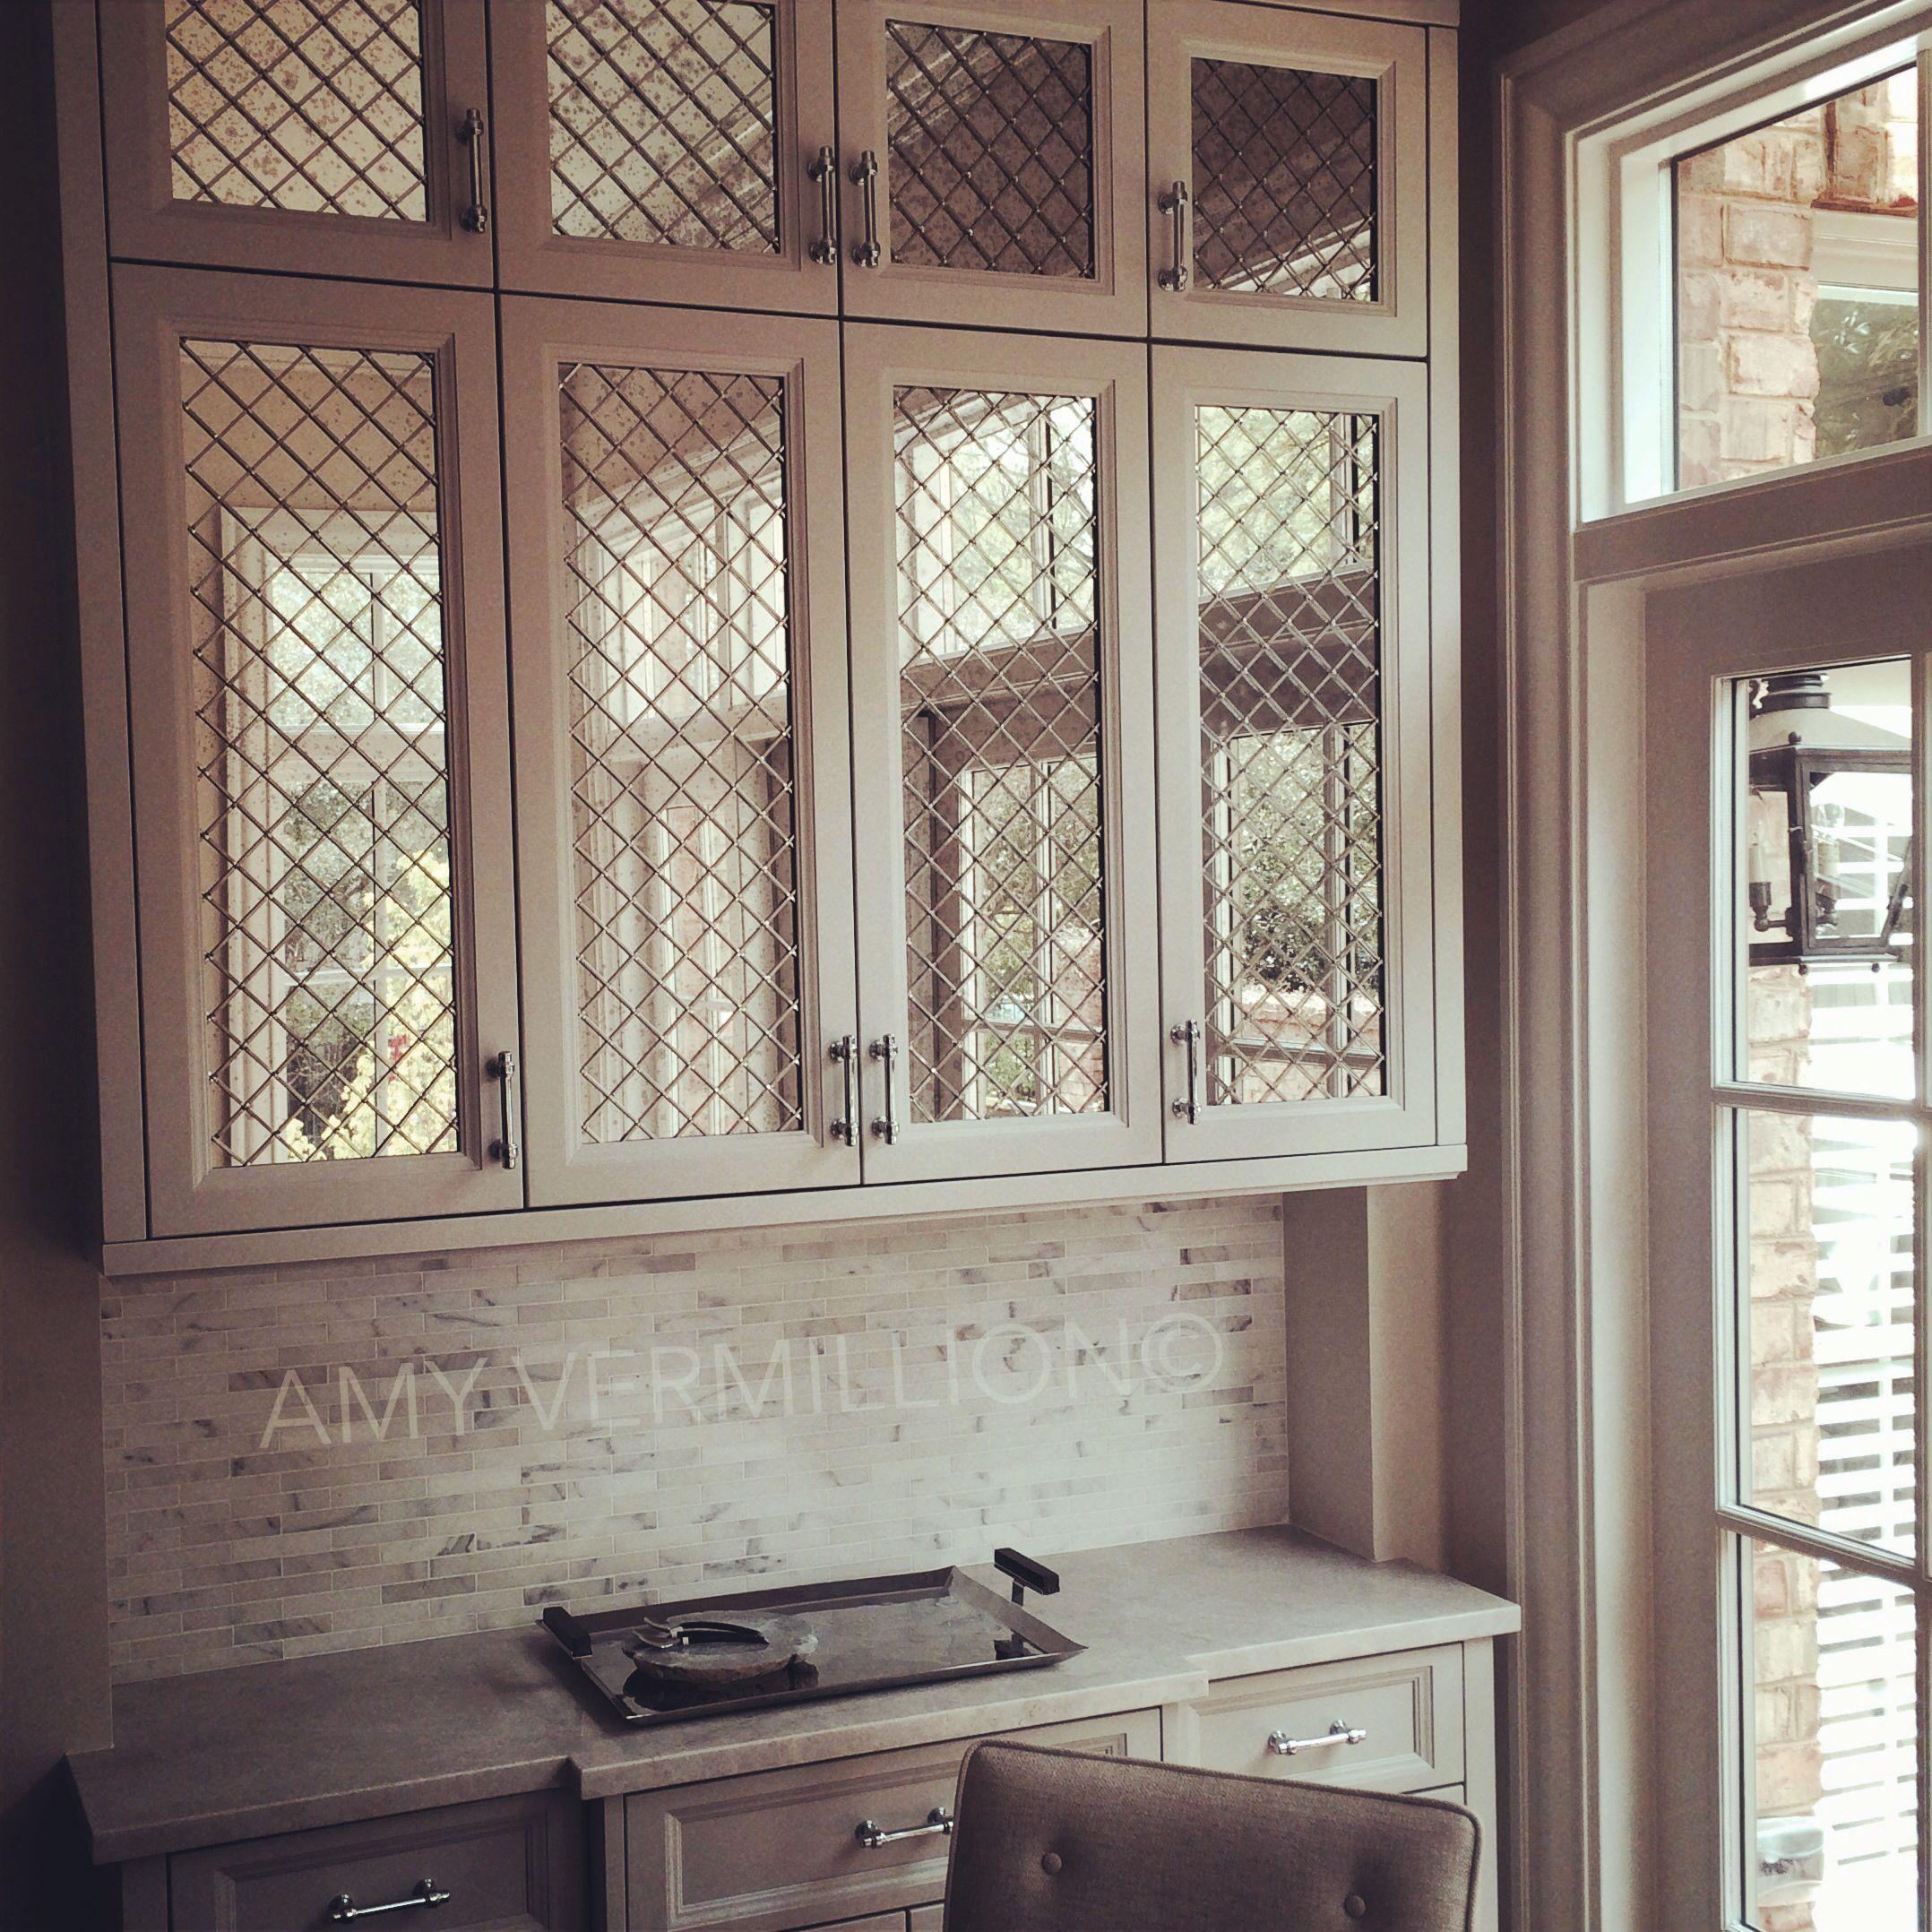 Amy Vermillion Interiors - Antique Mirror behind nickel wire   Amy ...